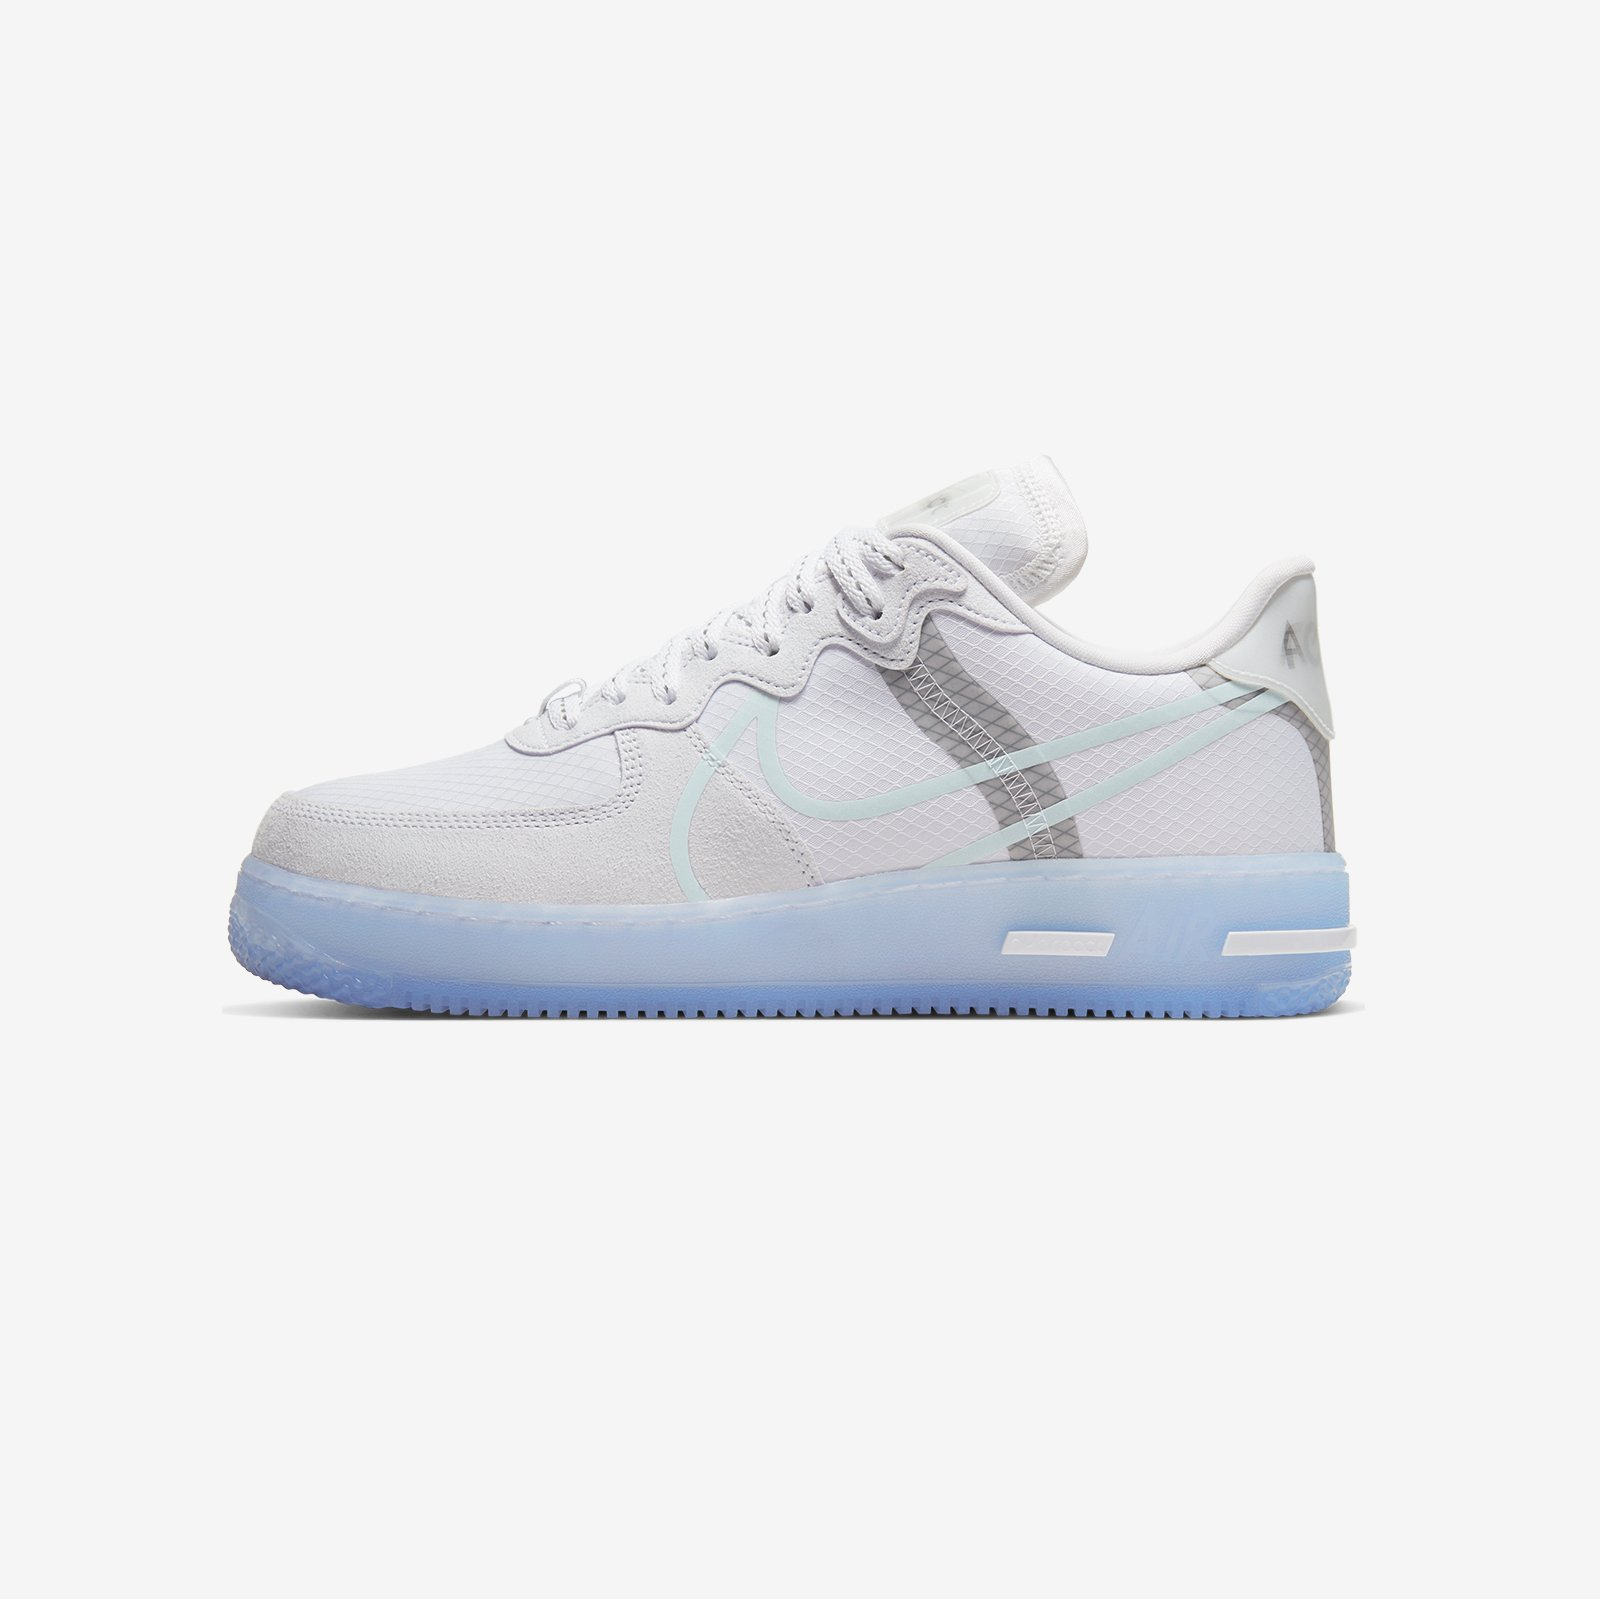 Nike Air Force 1 React QS - Cq8879-100 - Sneakersnstuff ...